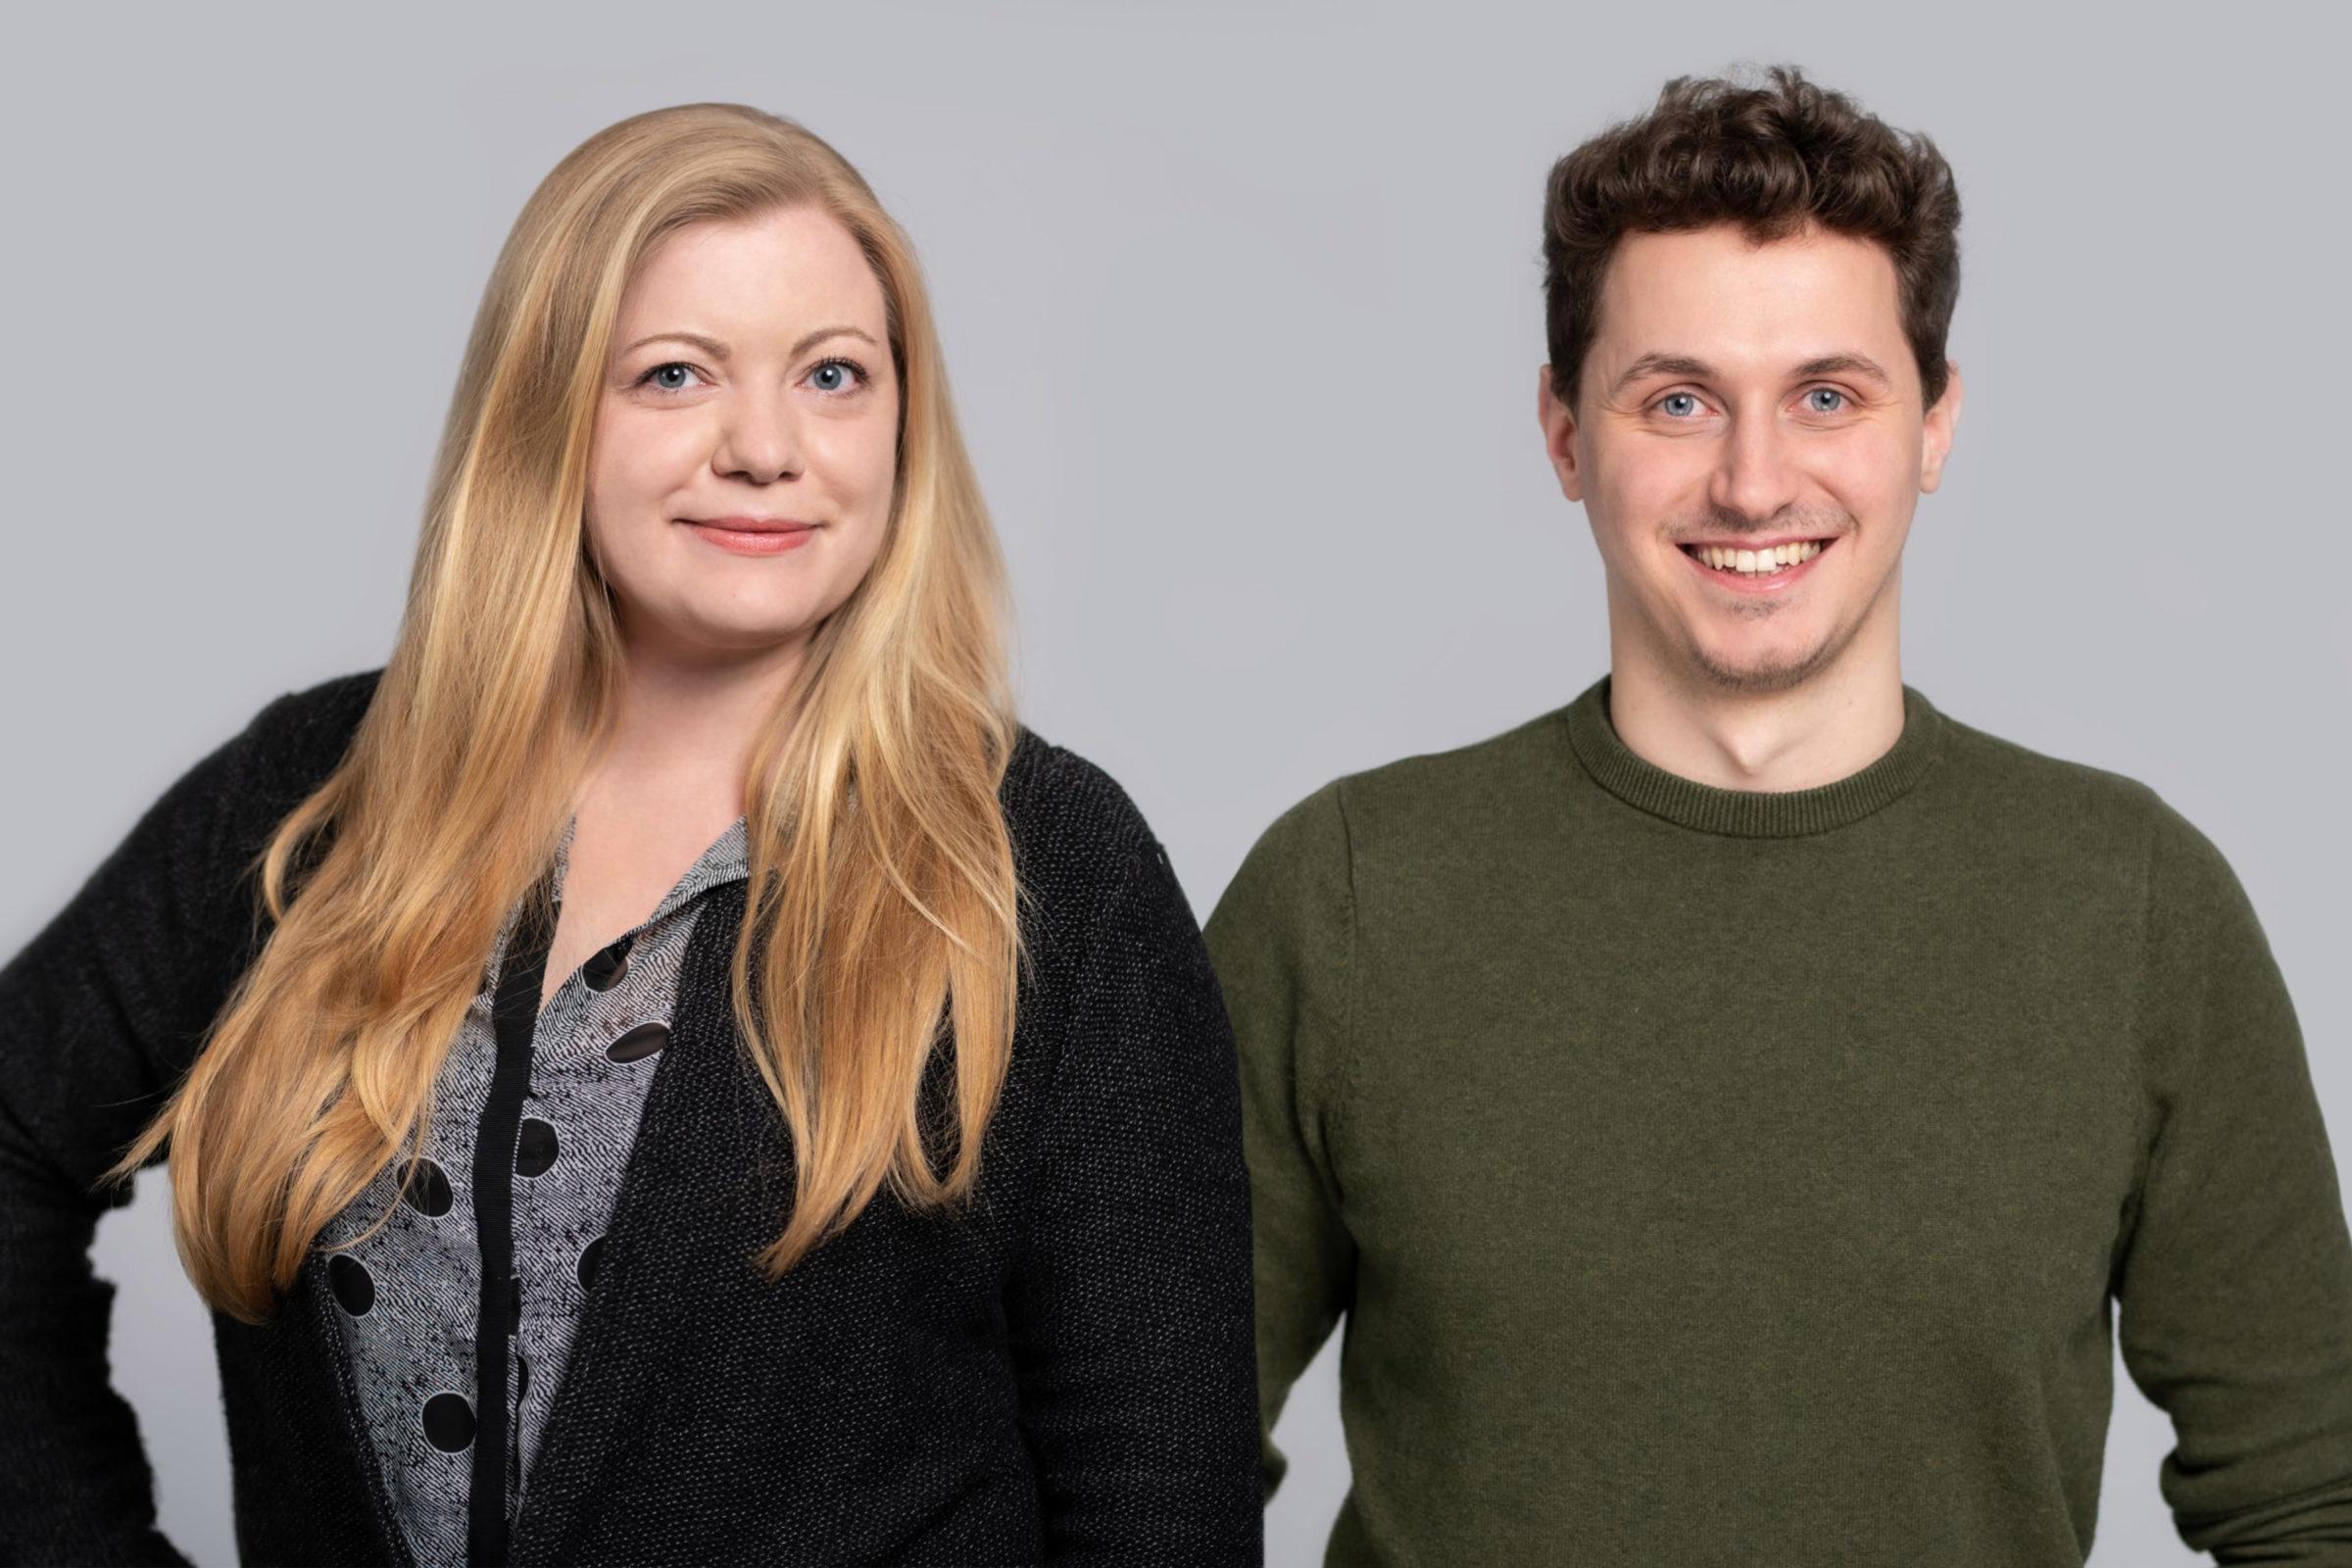 Kontakt aufnehmen zu Objego - Kontaktfoto Katja und Lukas